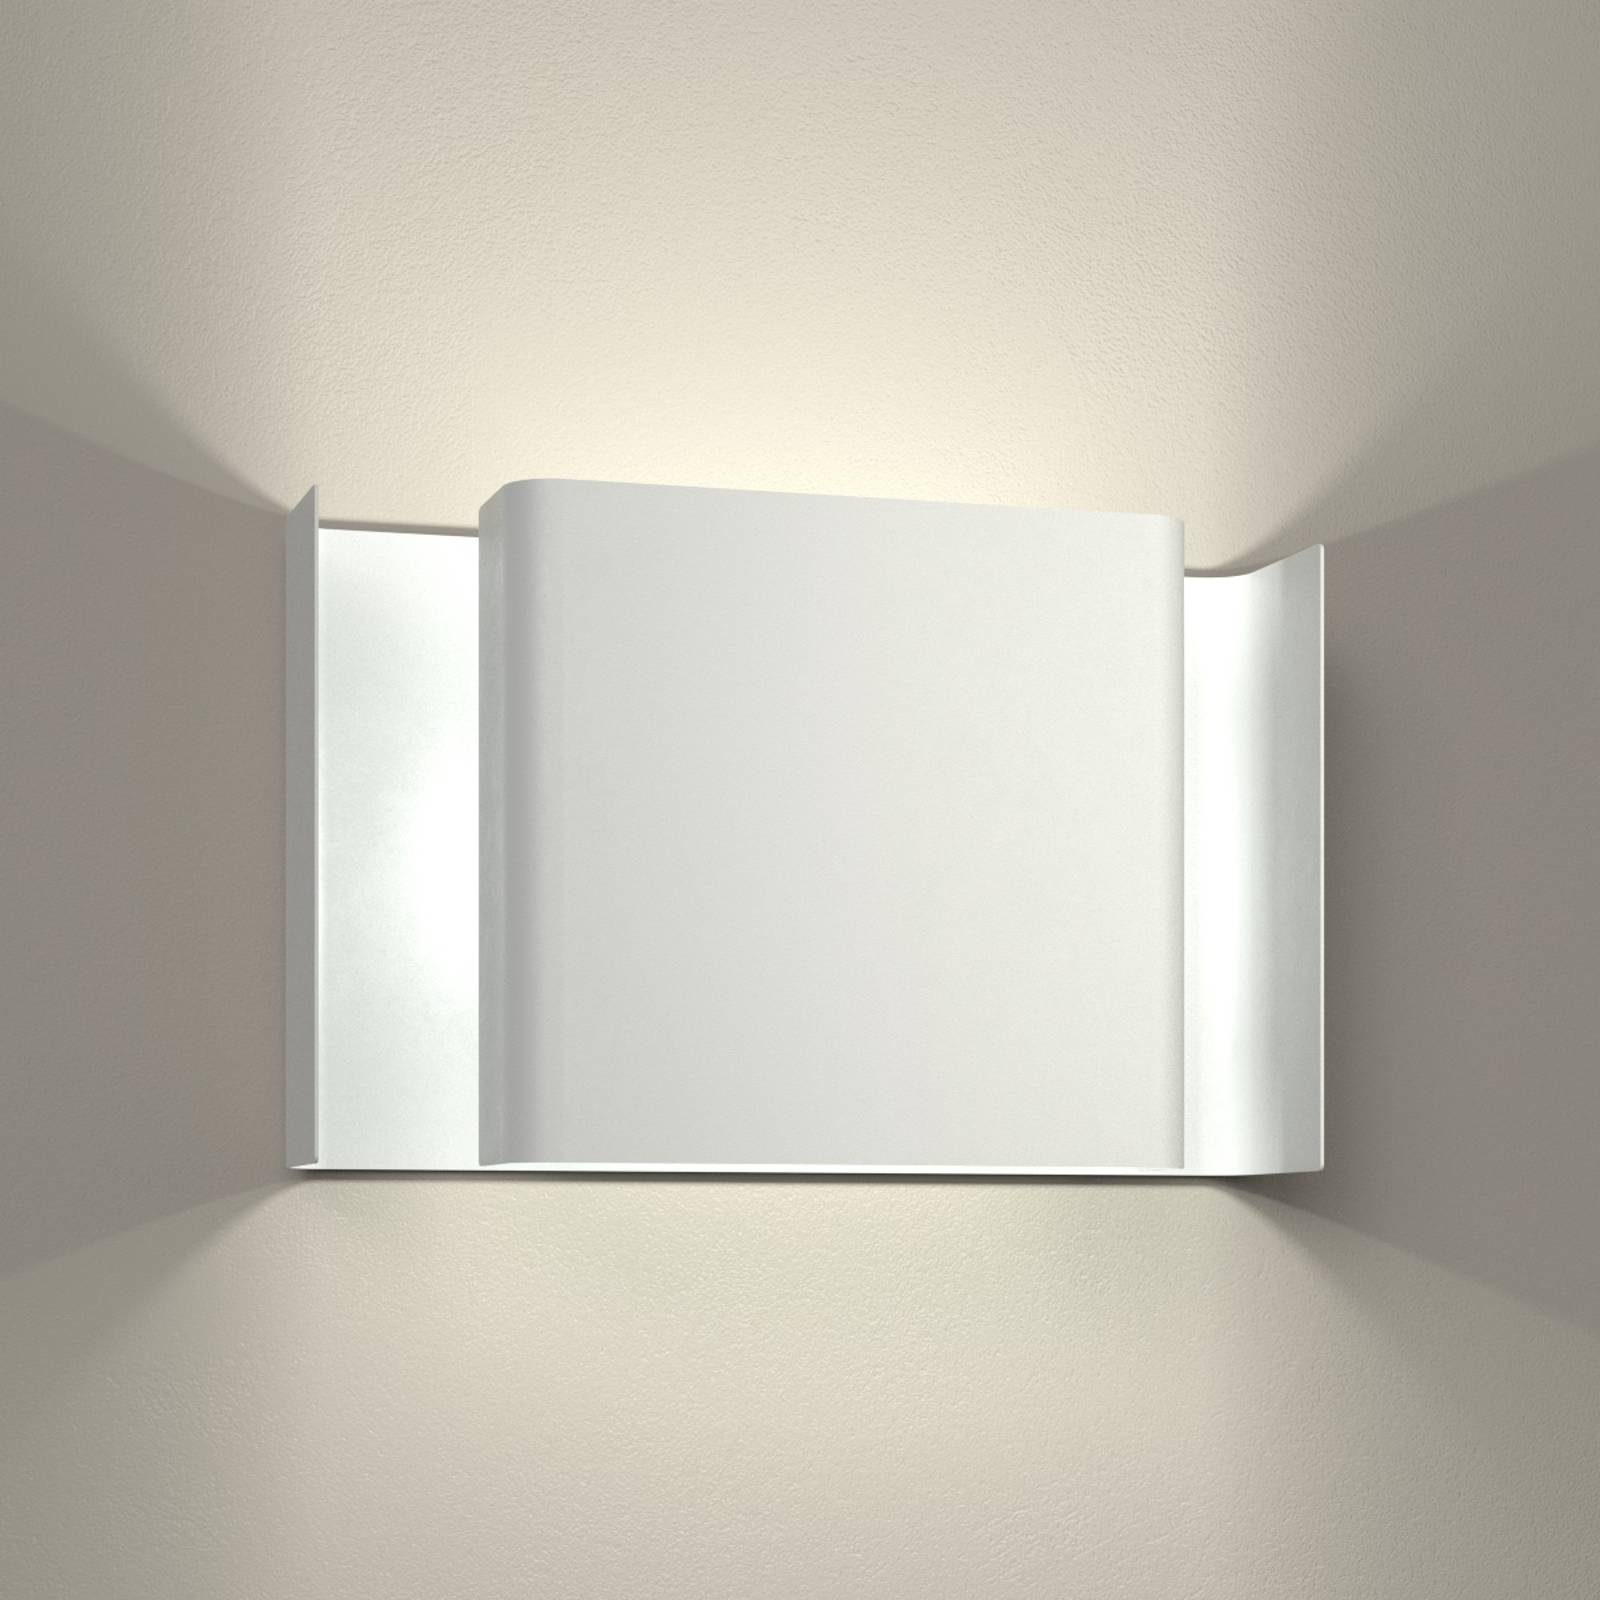 Applique LED Alalunga blanche